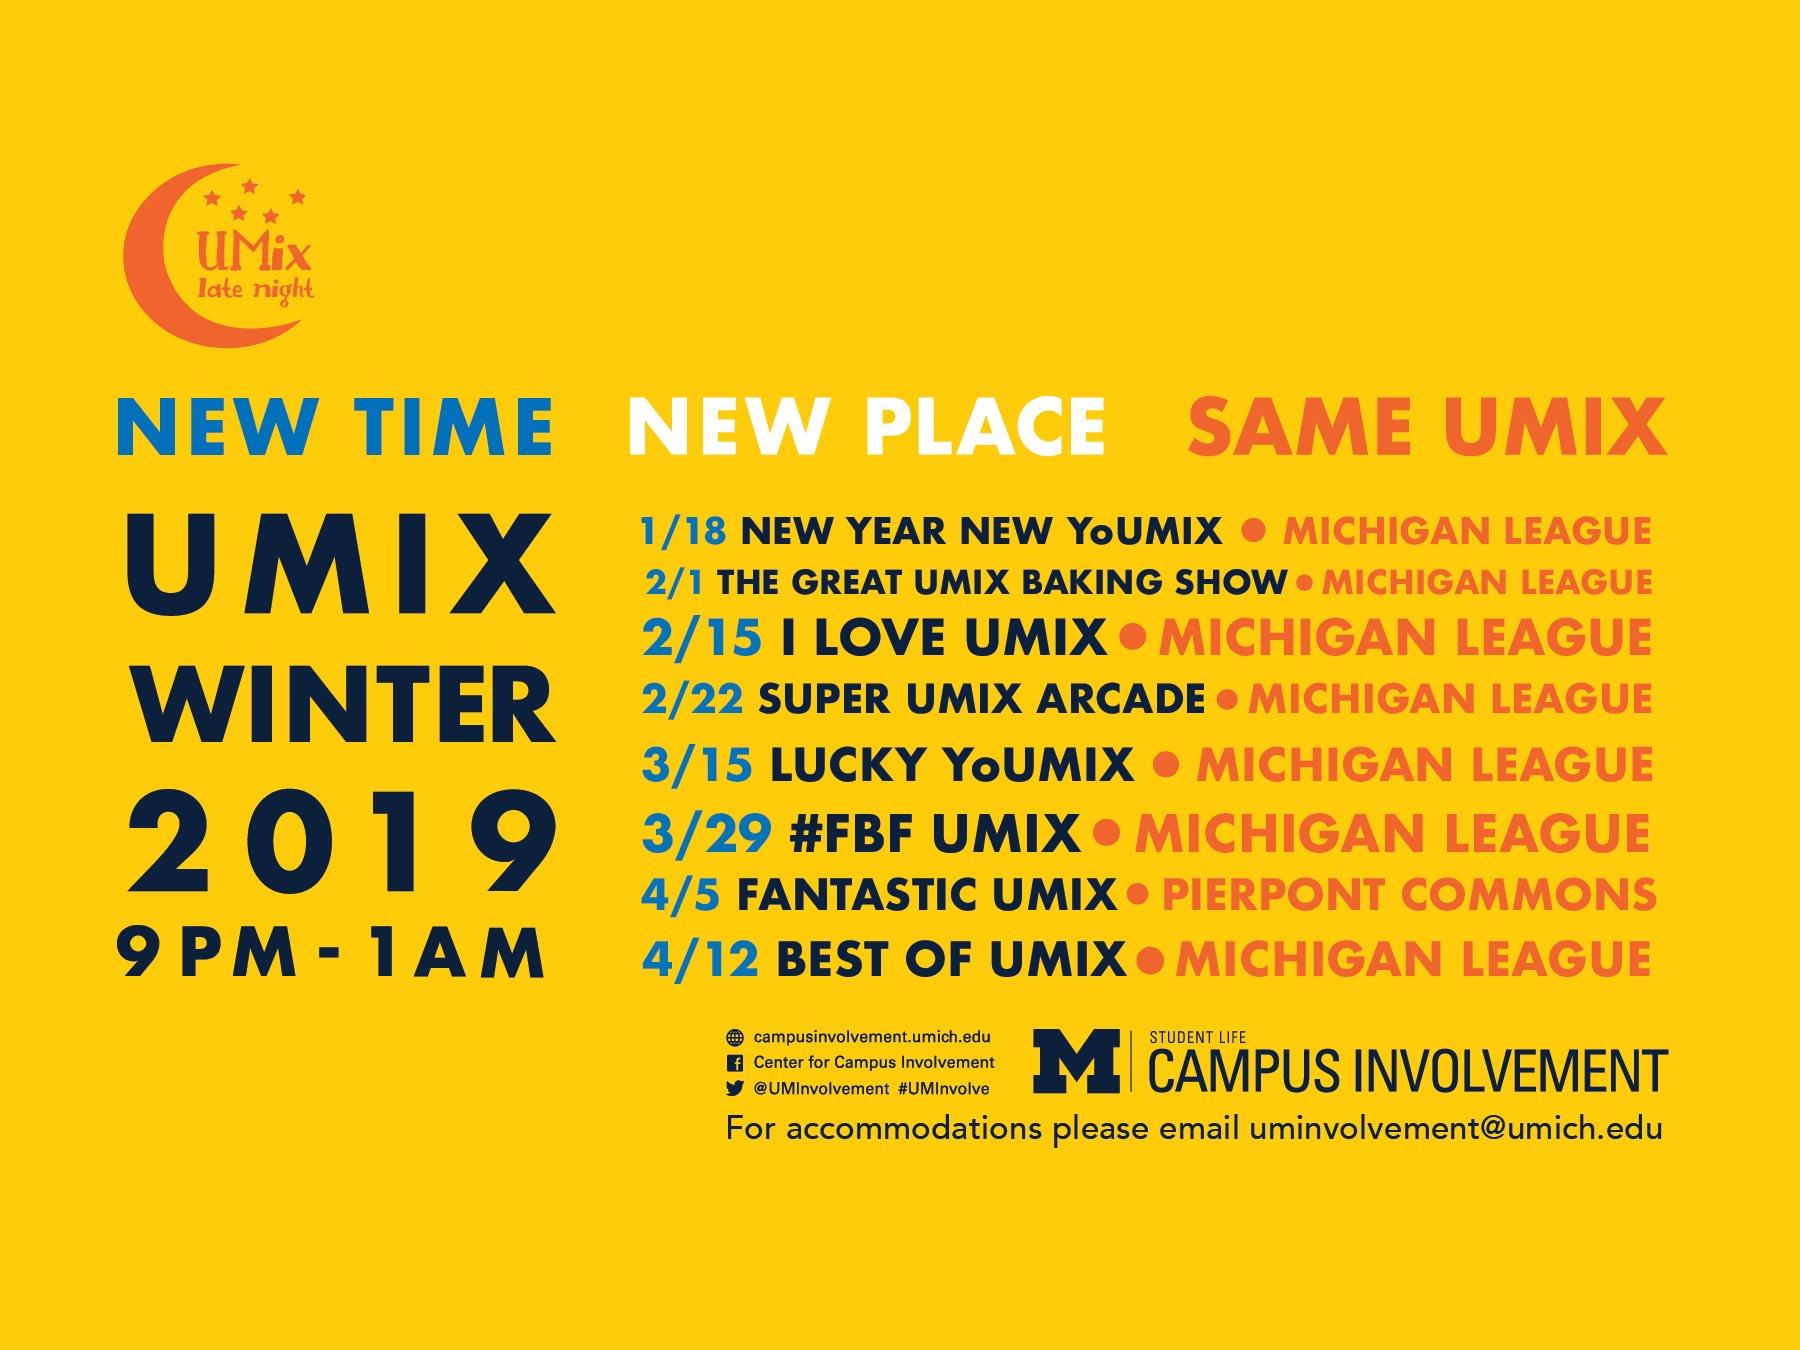 Umix Winter 2019 | Campus Involvement U Michigan Calendar 2019